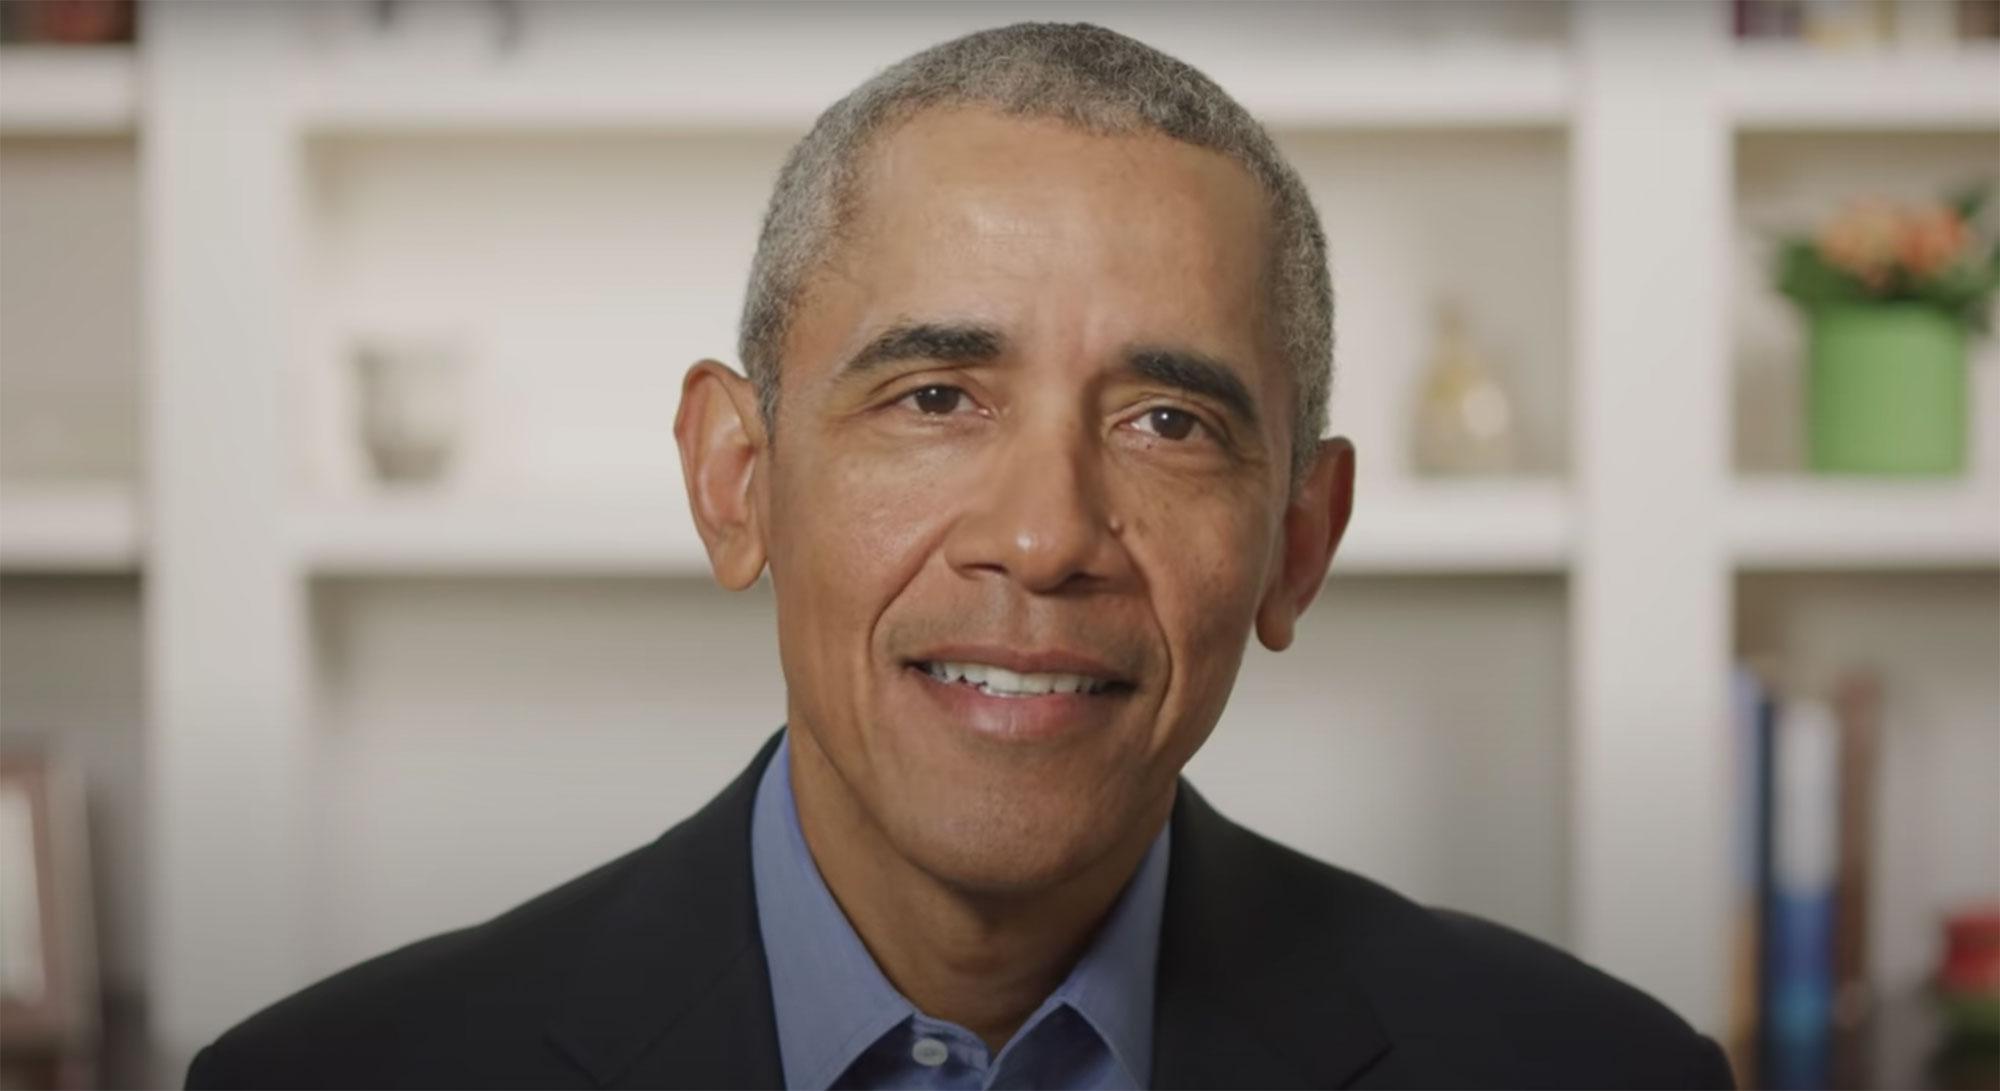 Barack Obama commencement speech